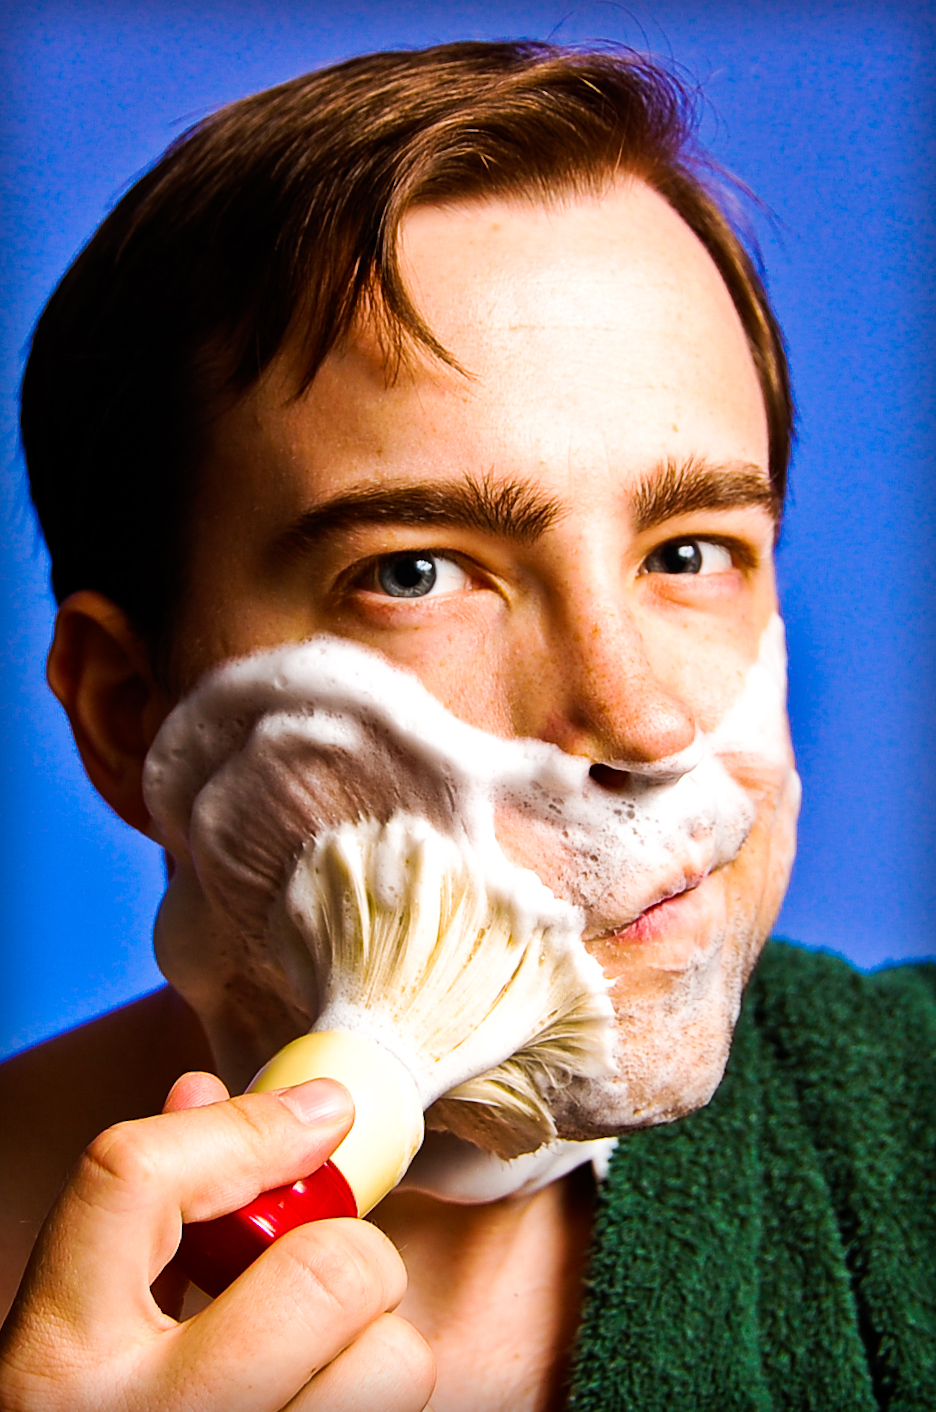 entretien-barbe